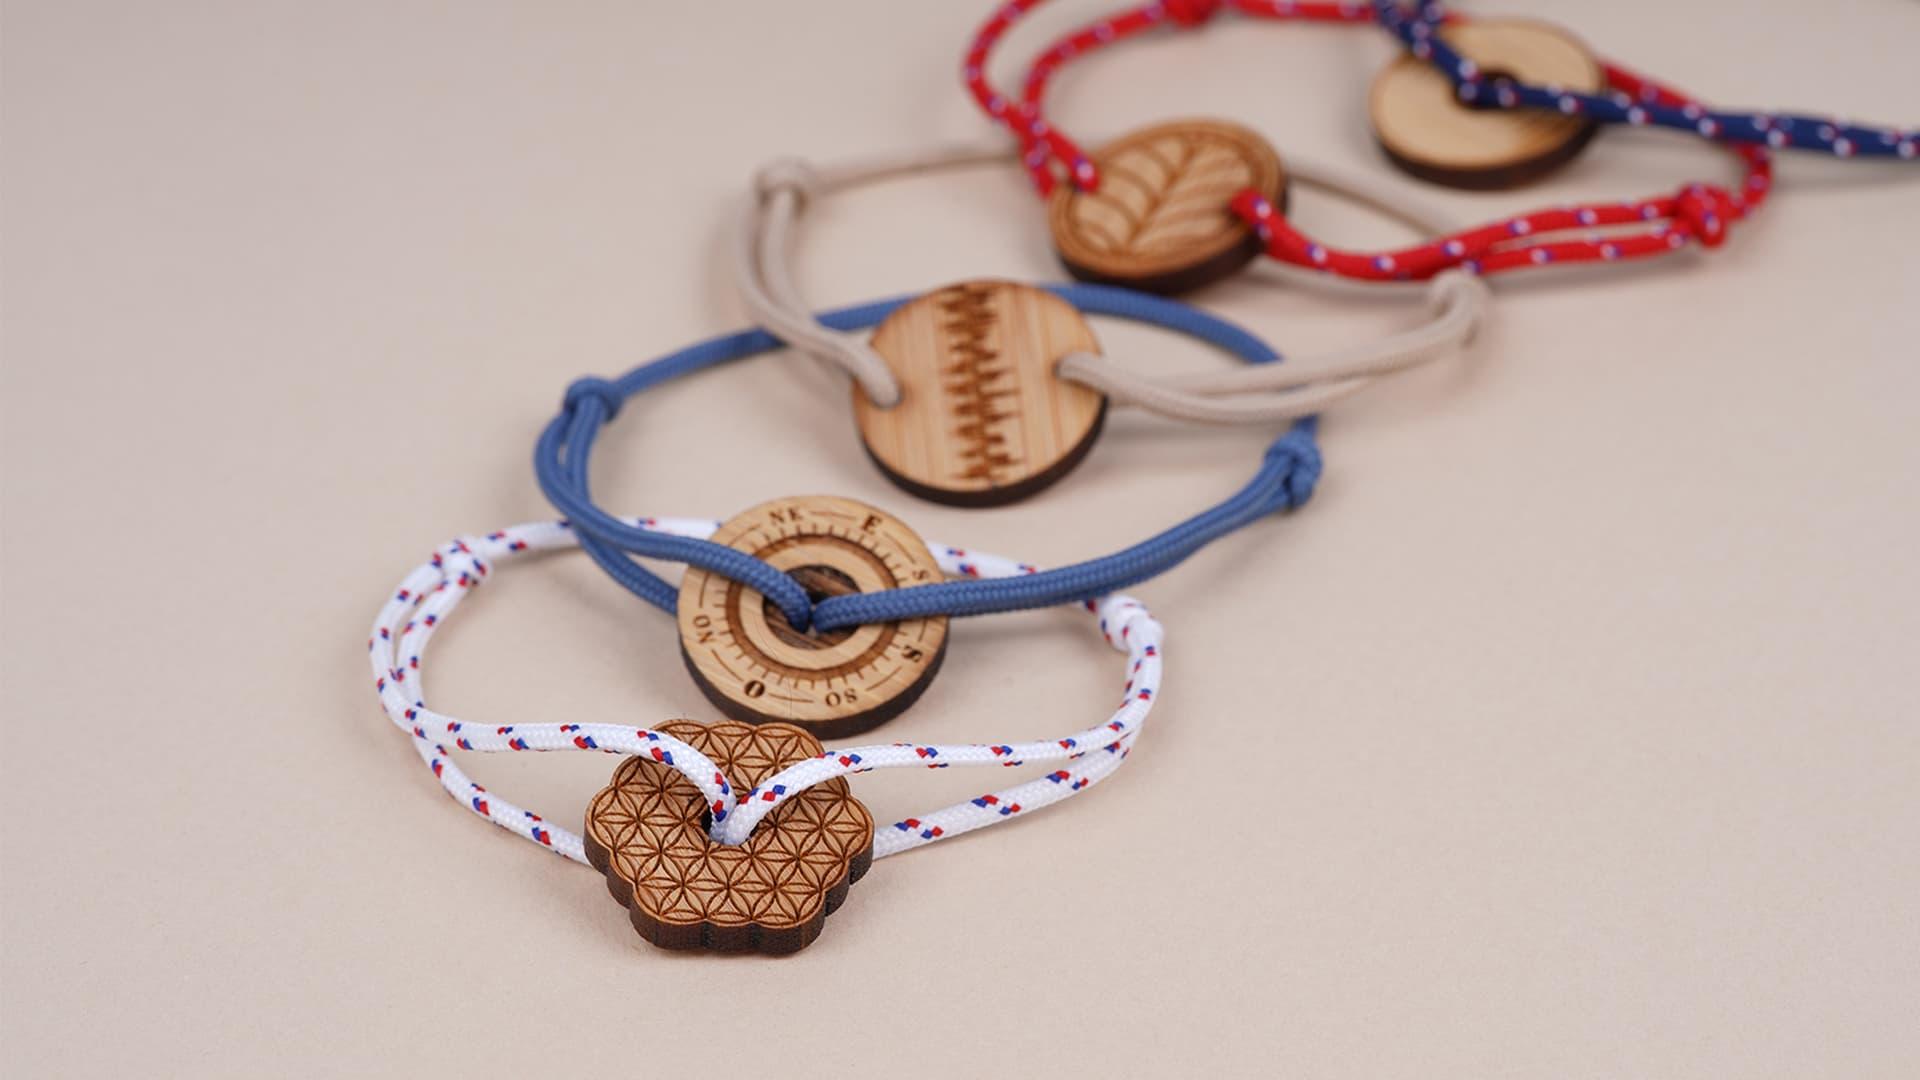 bijou made in france bracelets cordons unisexes à noeuds coulissants